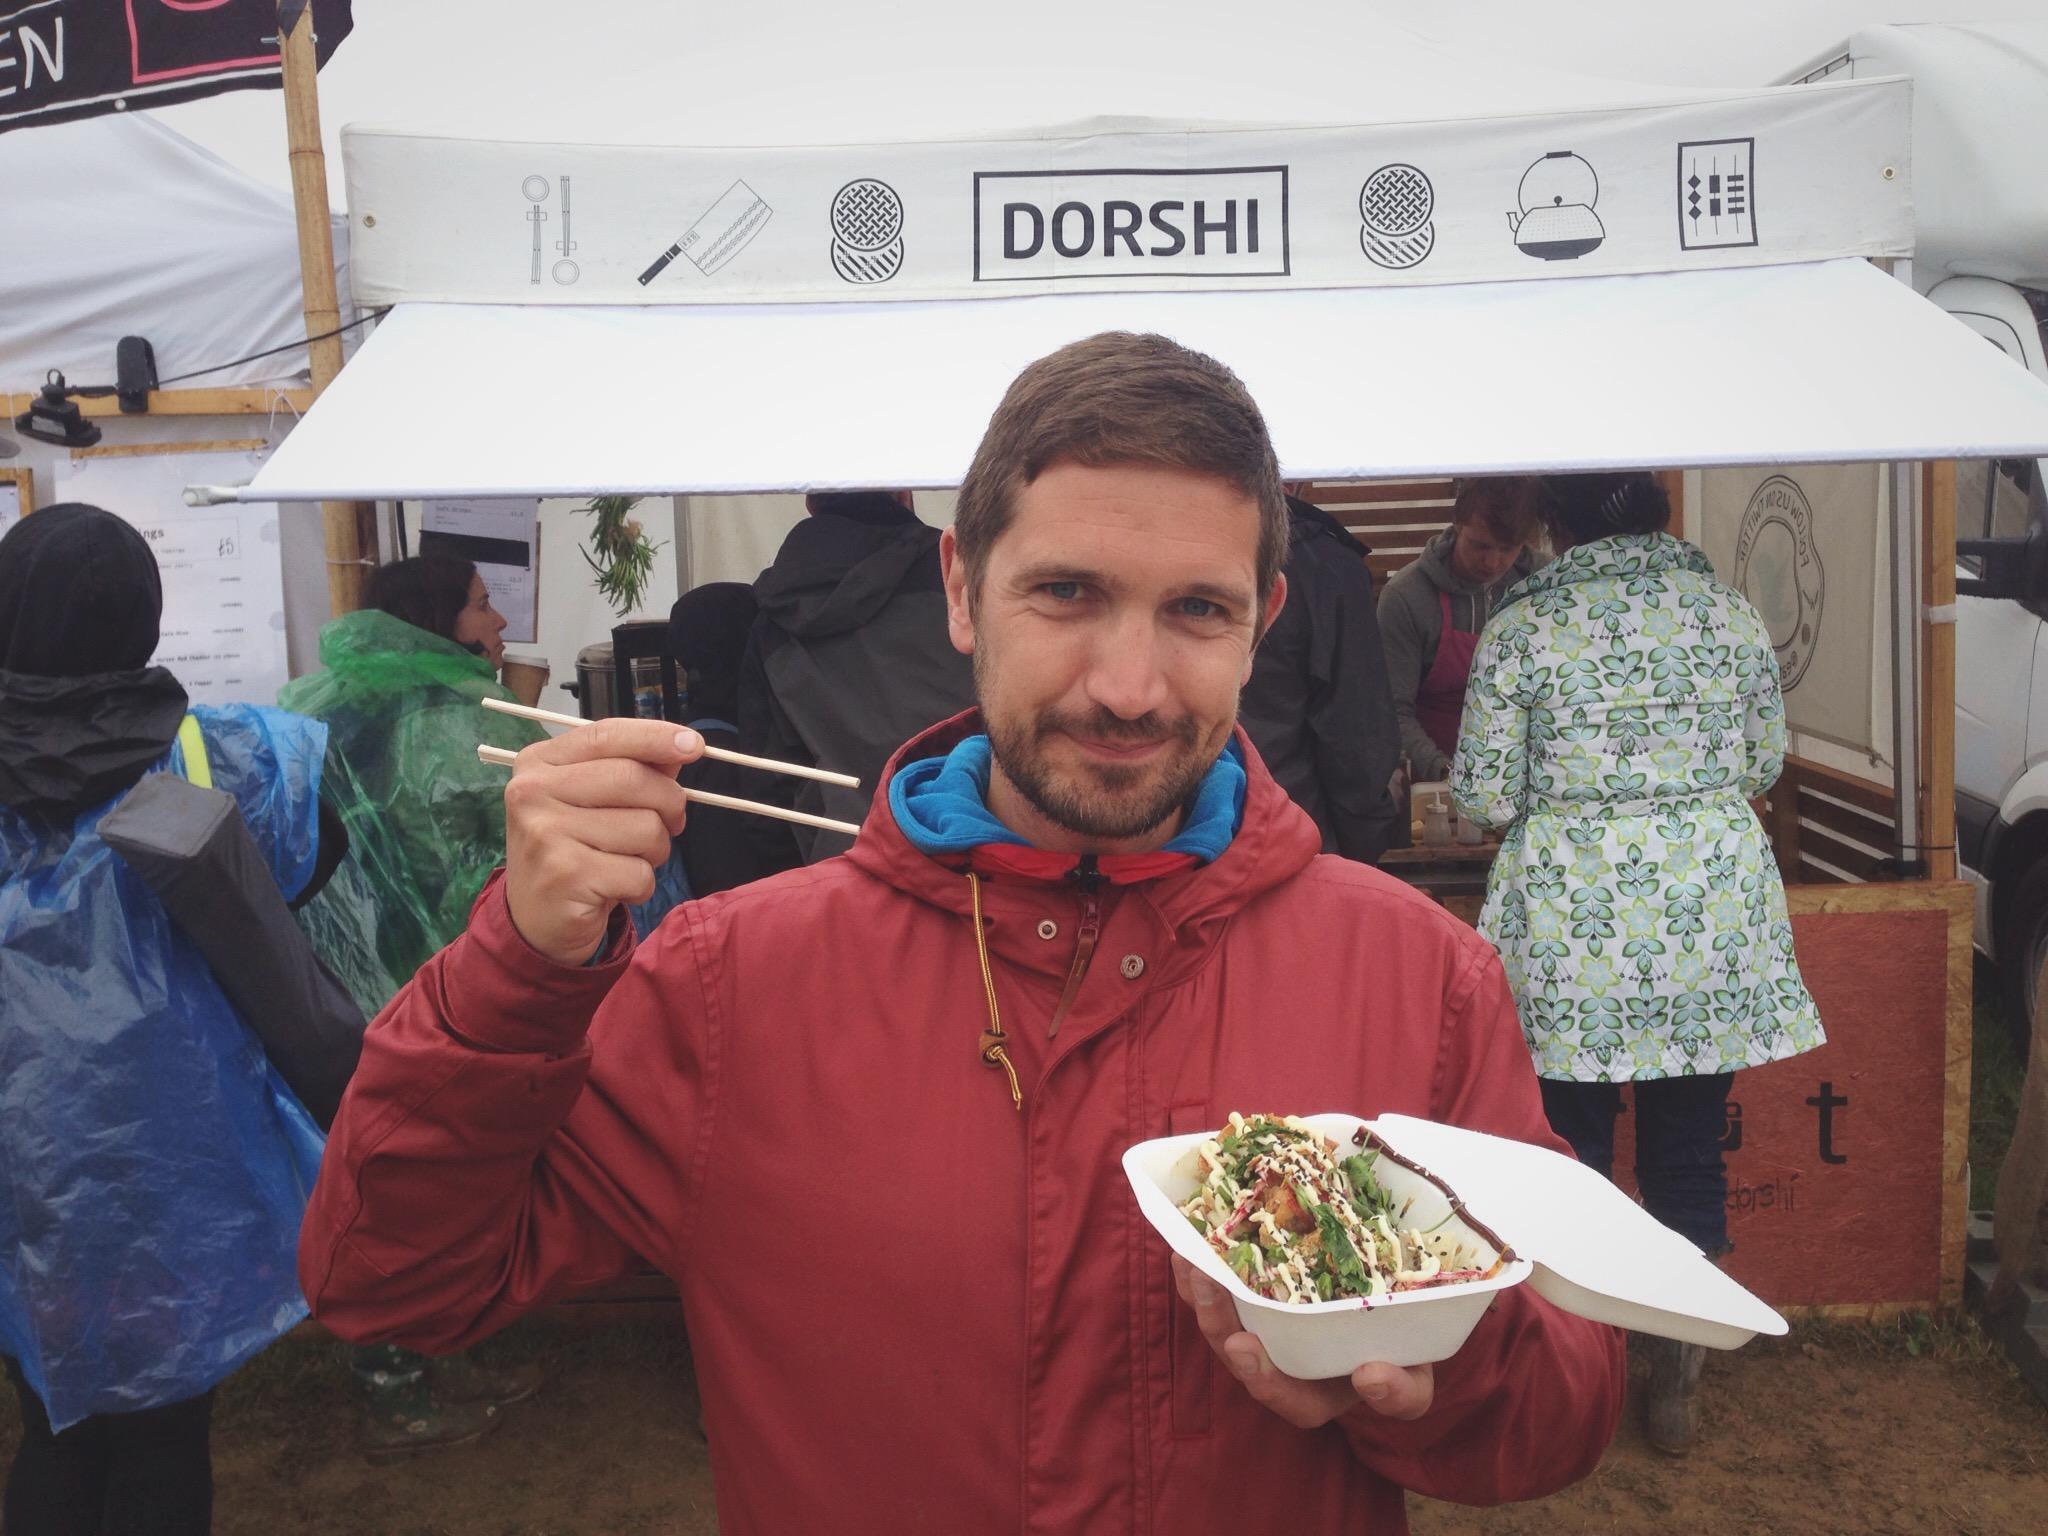 Amazing dumplings from Dorshi